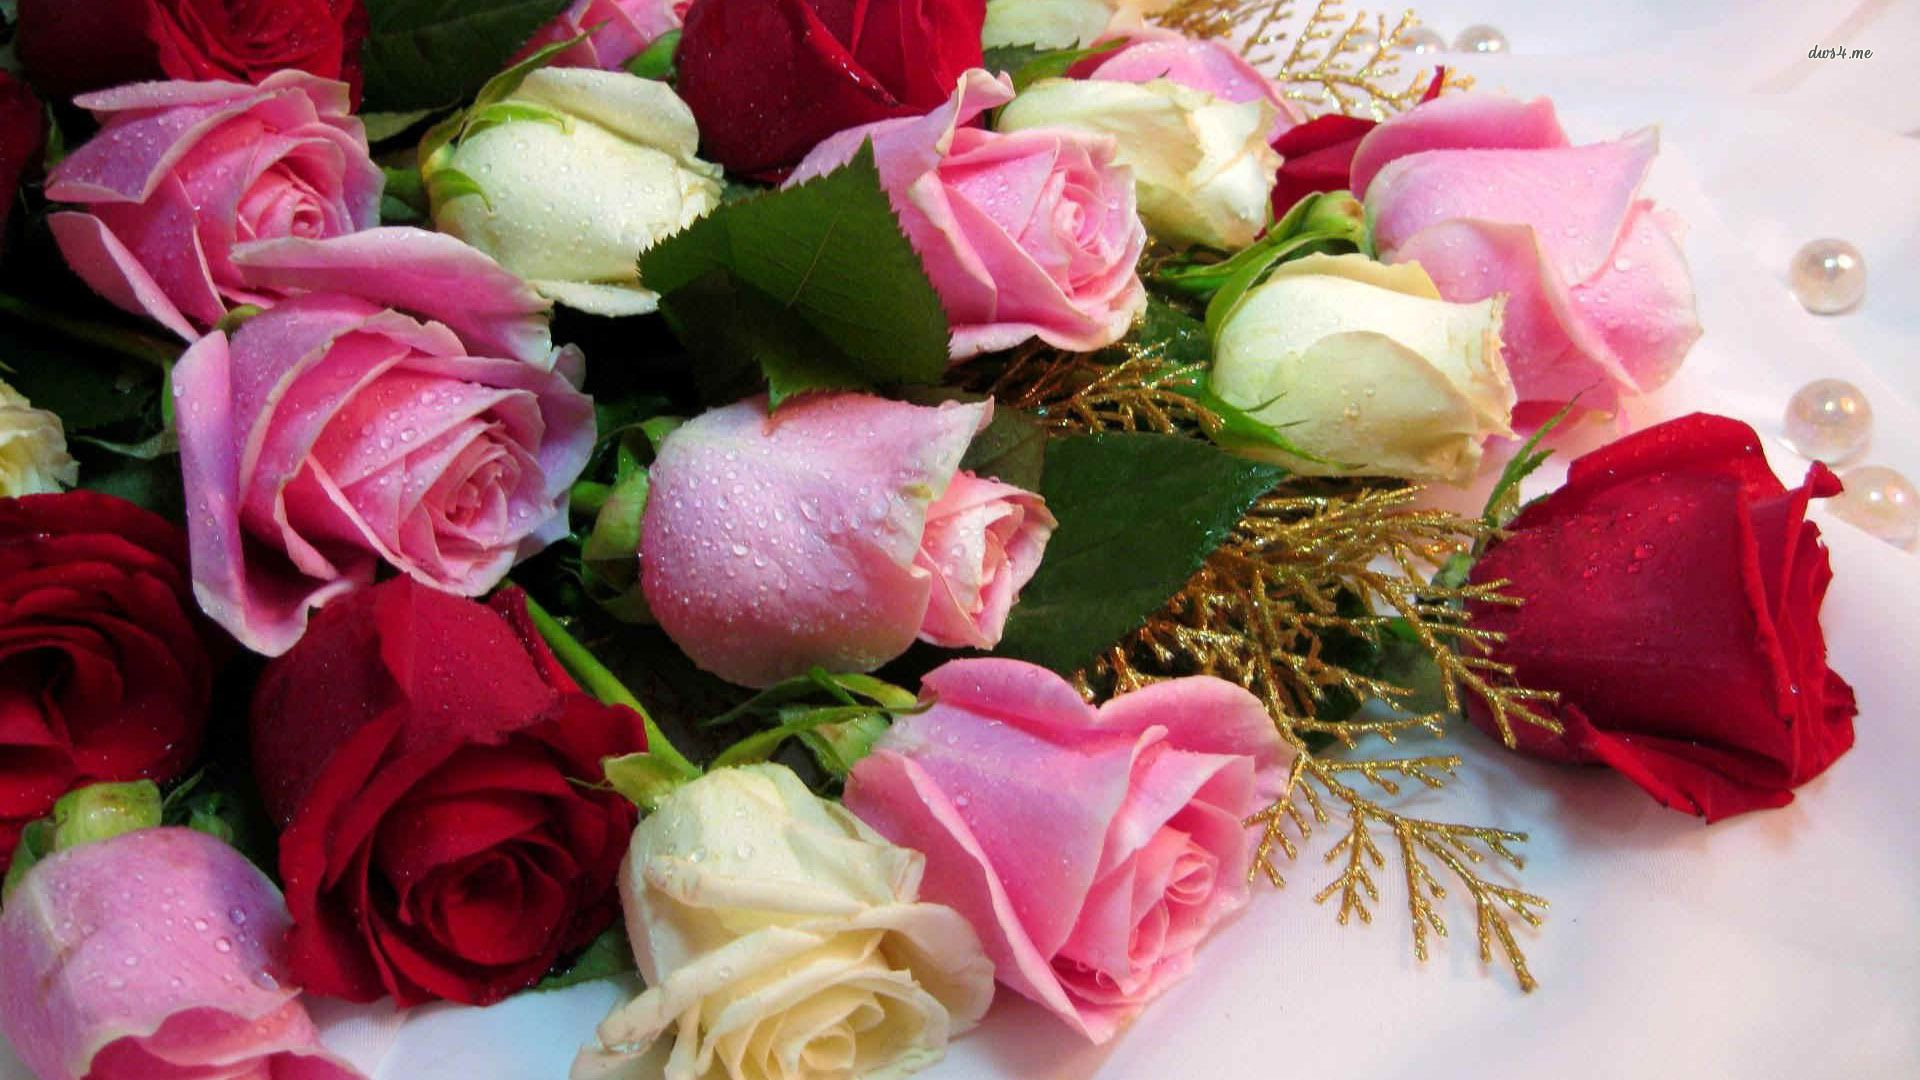 Flowers for bouquet of rose flowers wallpaper roses pinterest flowers for bouquet of rose flowers wallpaper izmirmasajfo